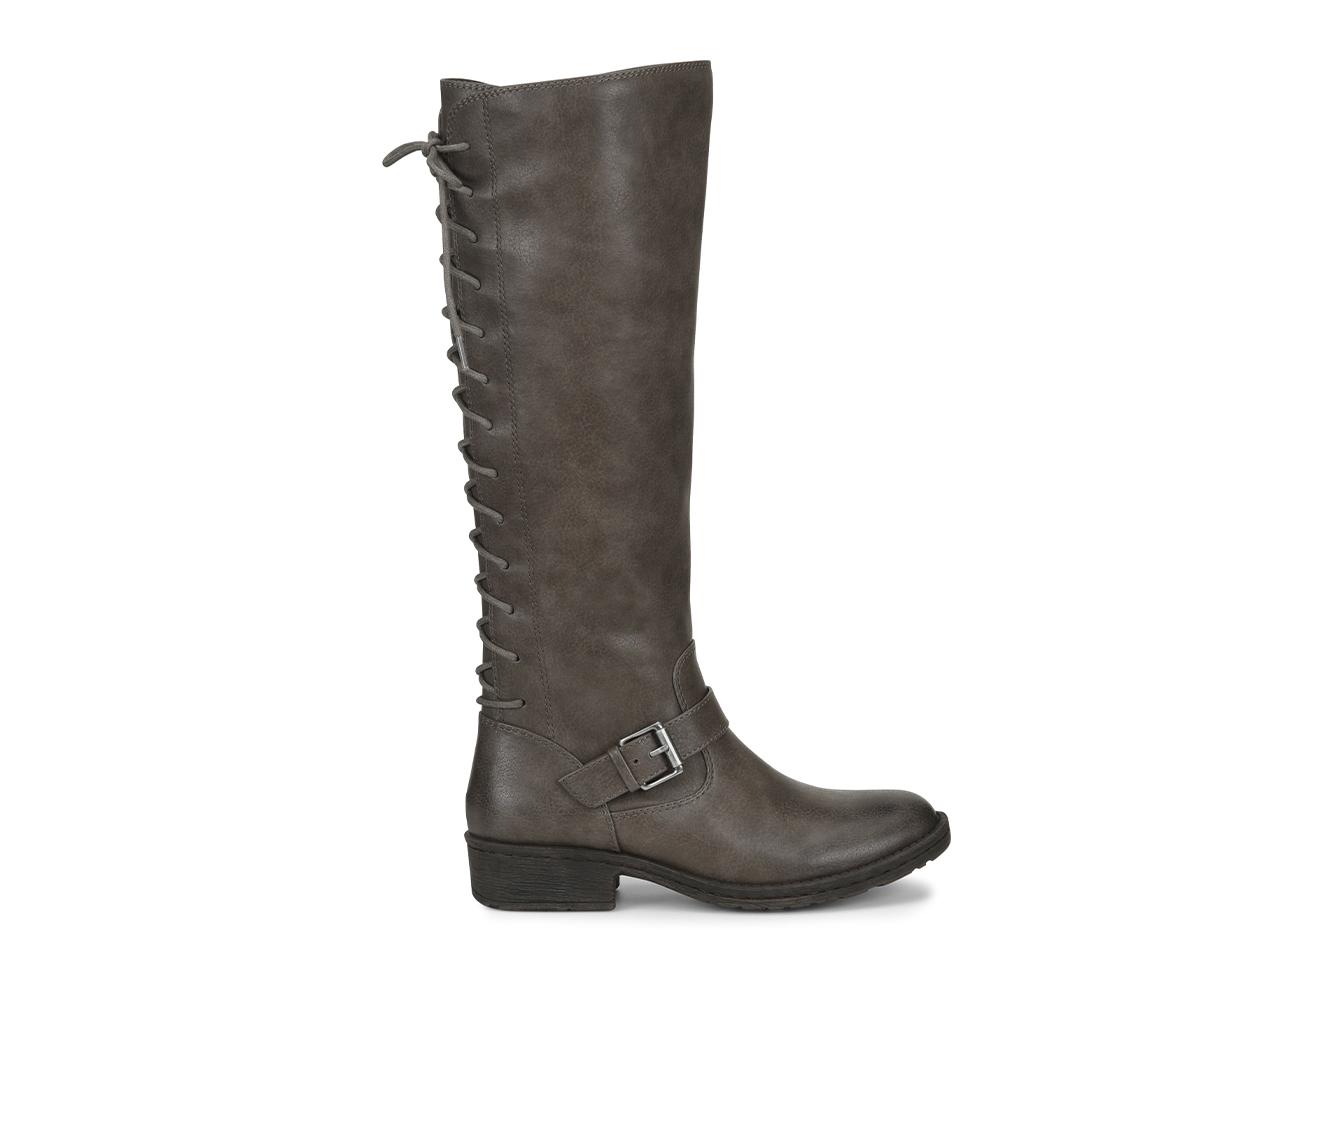 EuroSoft Selden Women's Boots (Gray - Faux Leather)